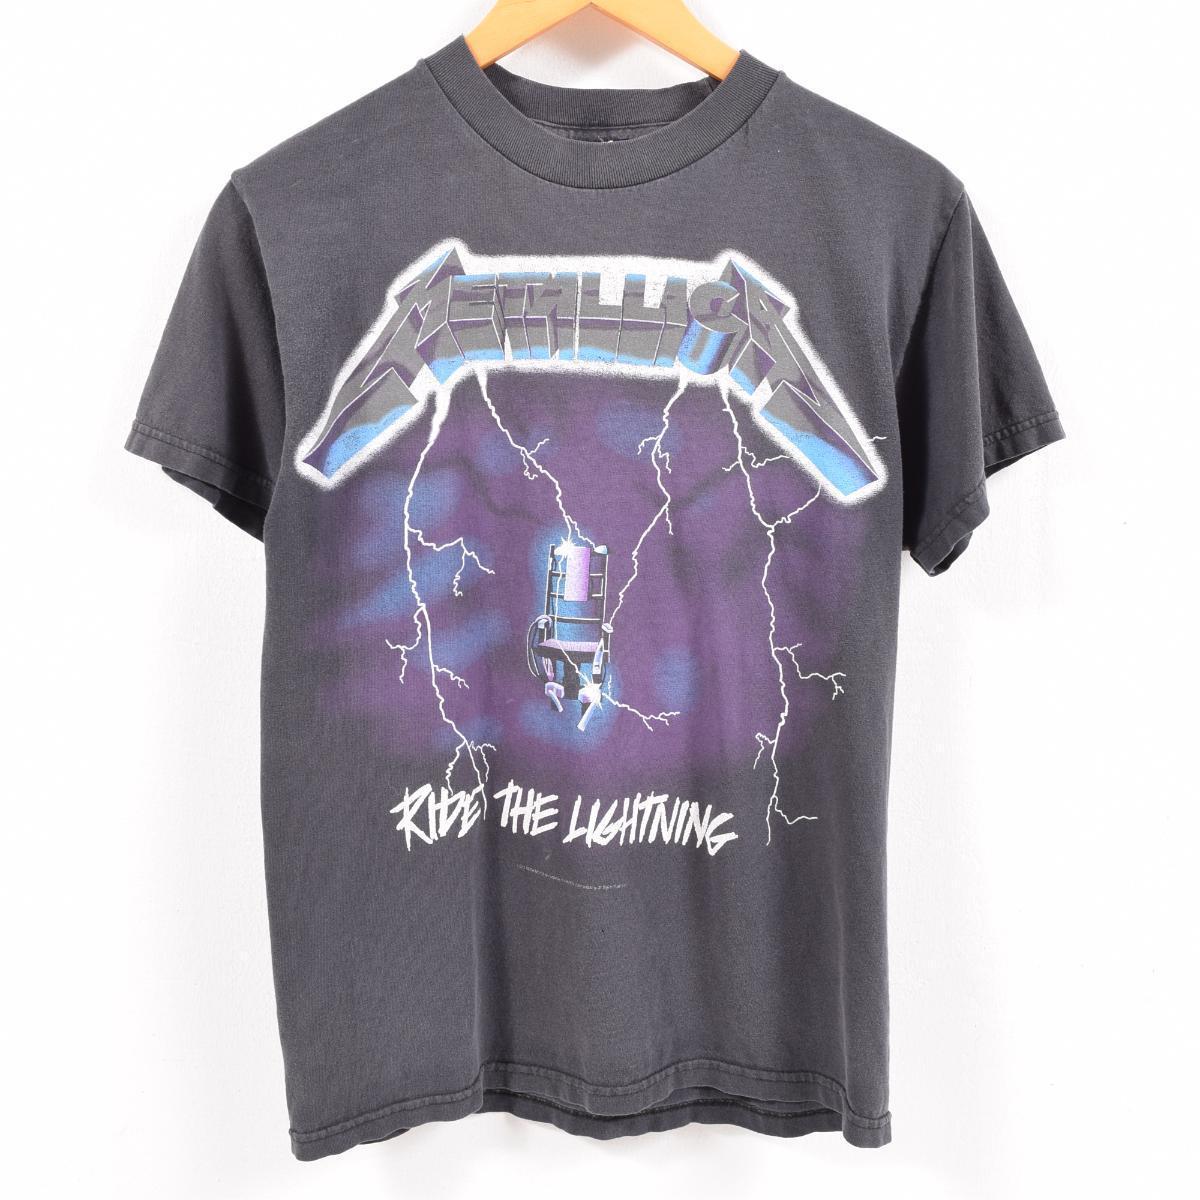 a6c25a802 ALSTYLE APPAREL   ACTIVEWEAR METALLICA Metallica RIDE THE LIGHTNING  ライドザライトニングバンド T-shirt men S  wbc2772